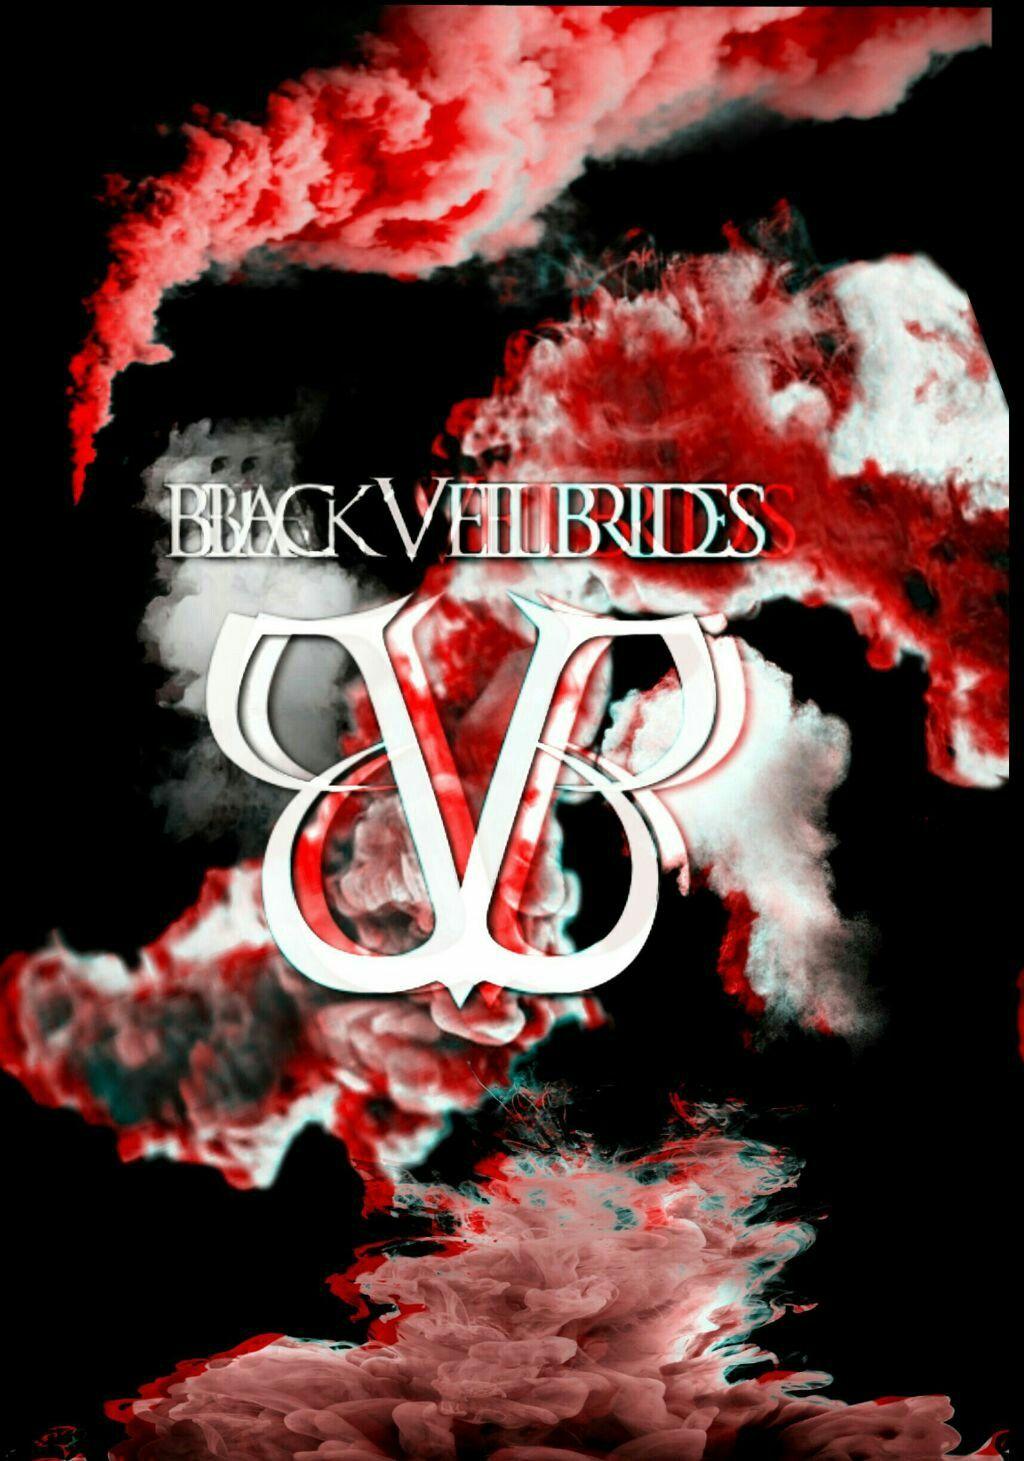 Pin By Gabodan On Black Veil Brides Black Veil Brides Black Veil Black Veil Brides Andy